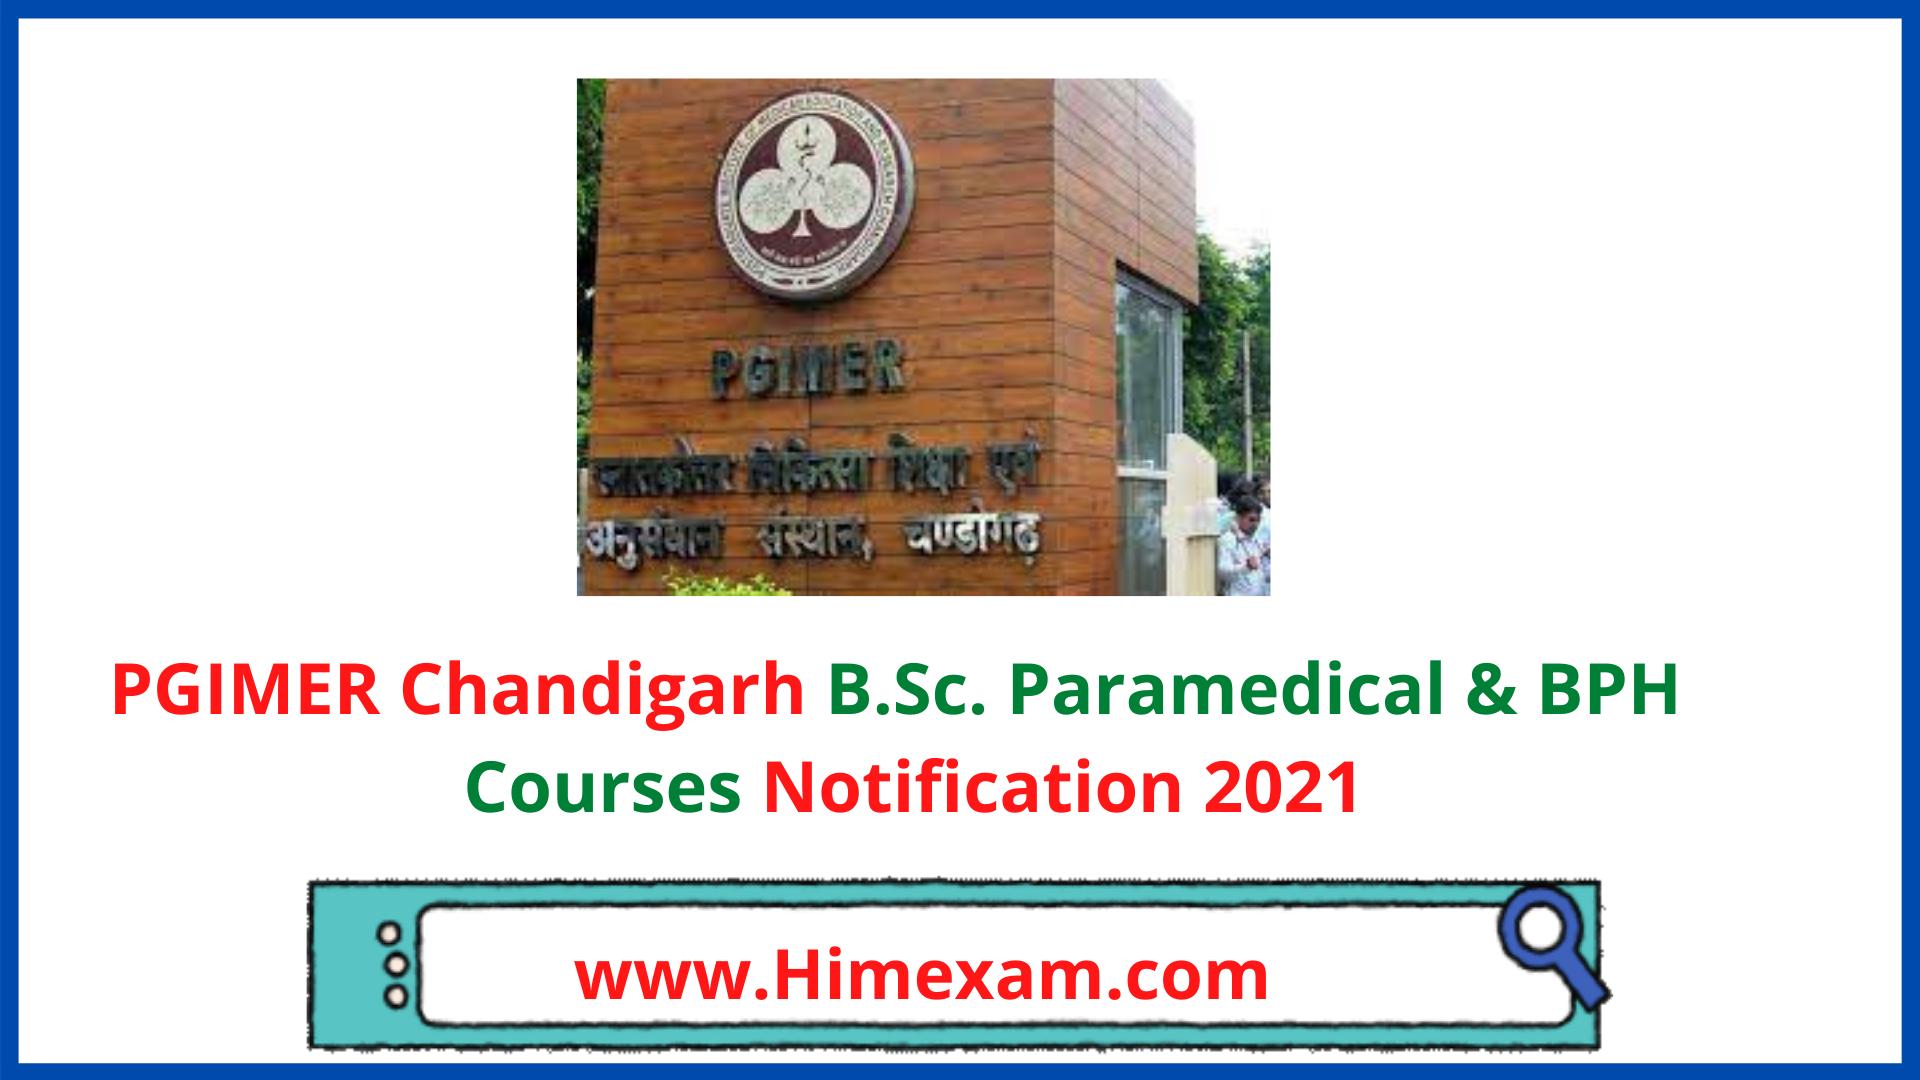 PGIMER Chandigarh Admission Notification 2021